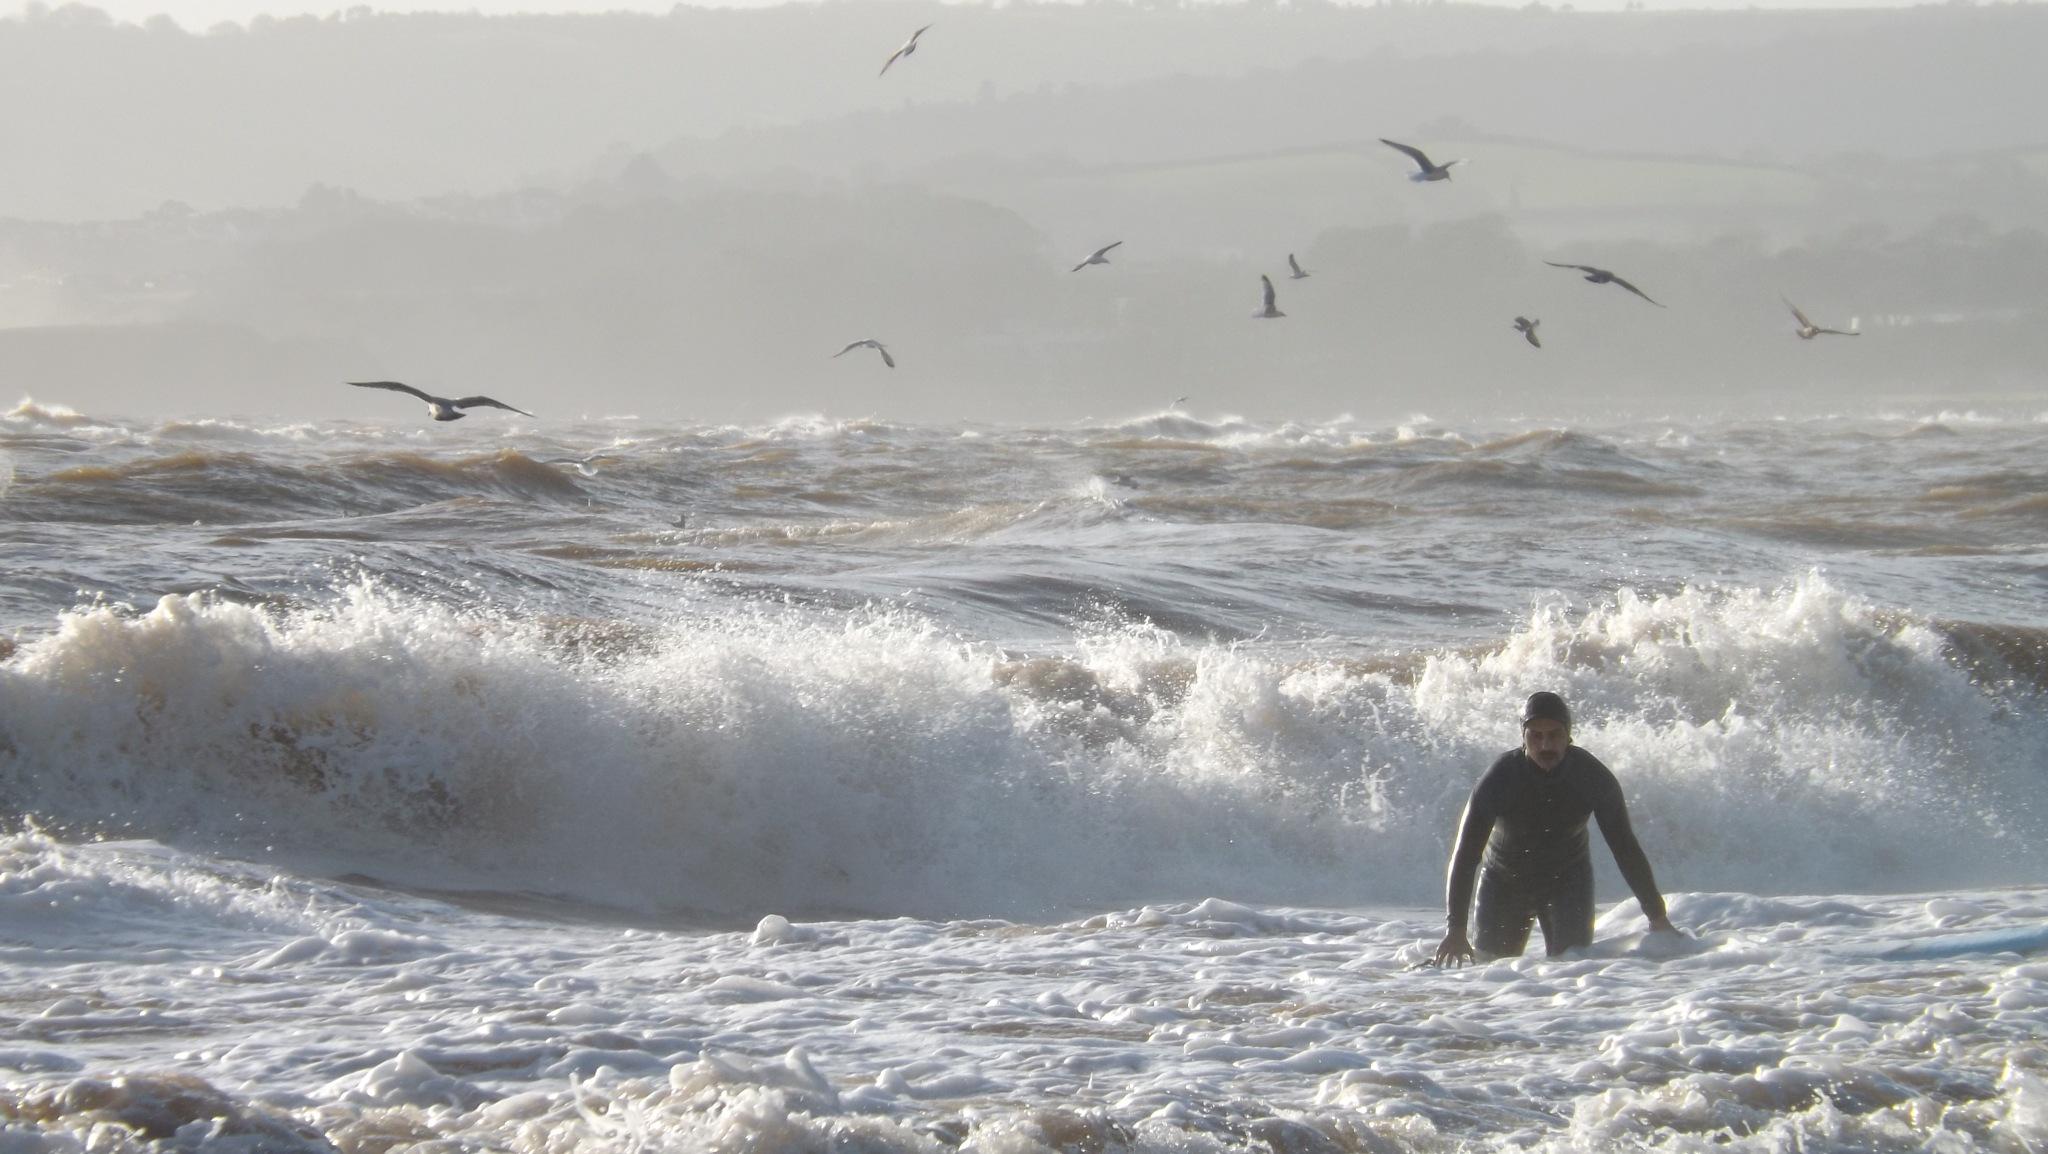 Stormy waters by beachbaby58